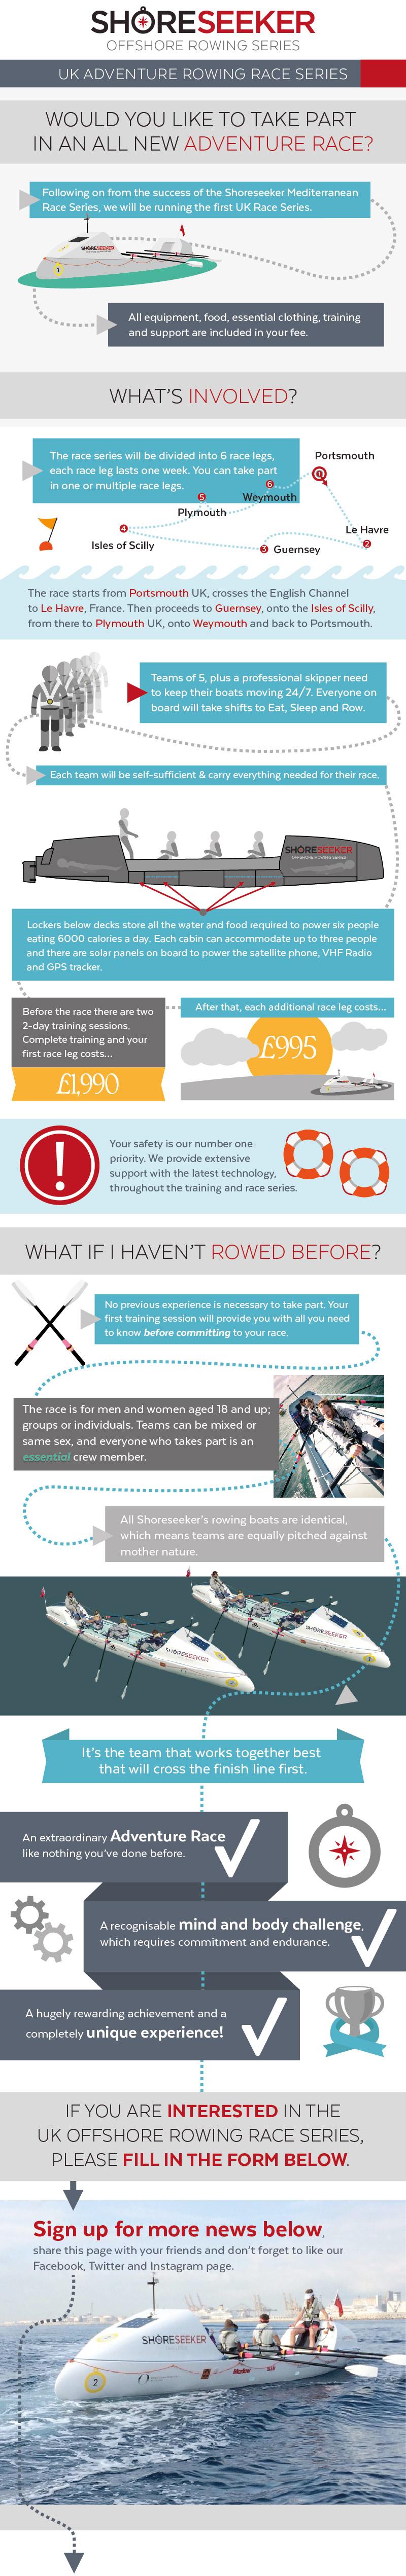 Shoreseeker UK Offshore Rowing Series Infographic.jpg